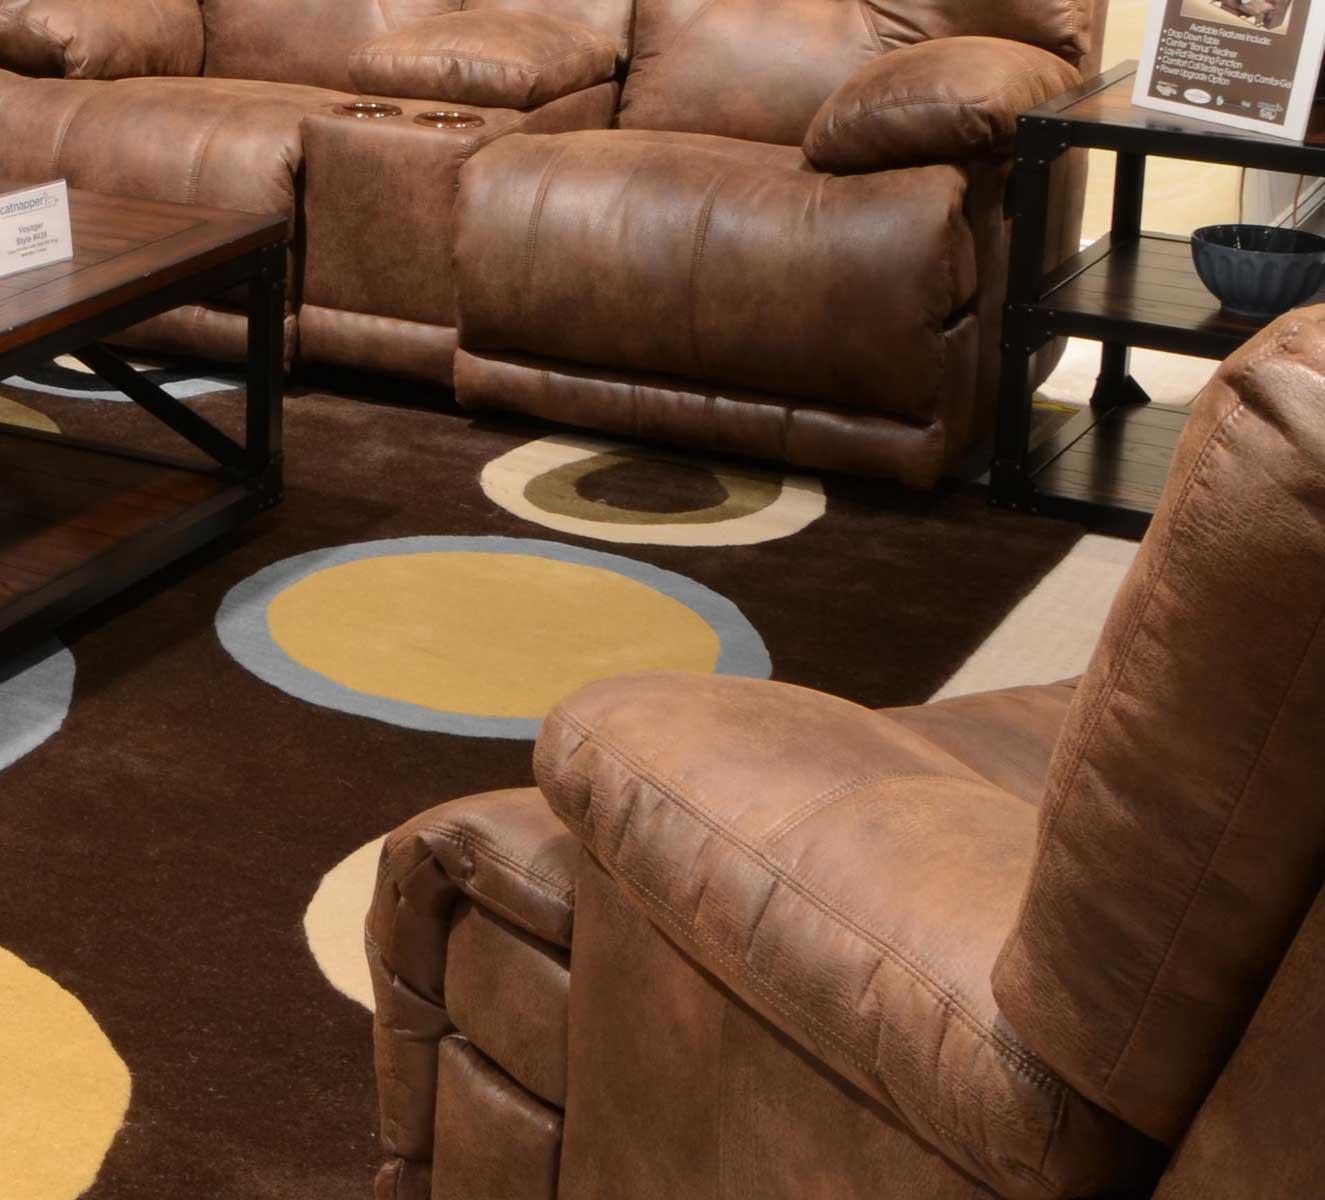 voyager lay flat triple reclining sofa elegant grey fabric futon bed catnapper recliner elk cn 43807 at